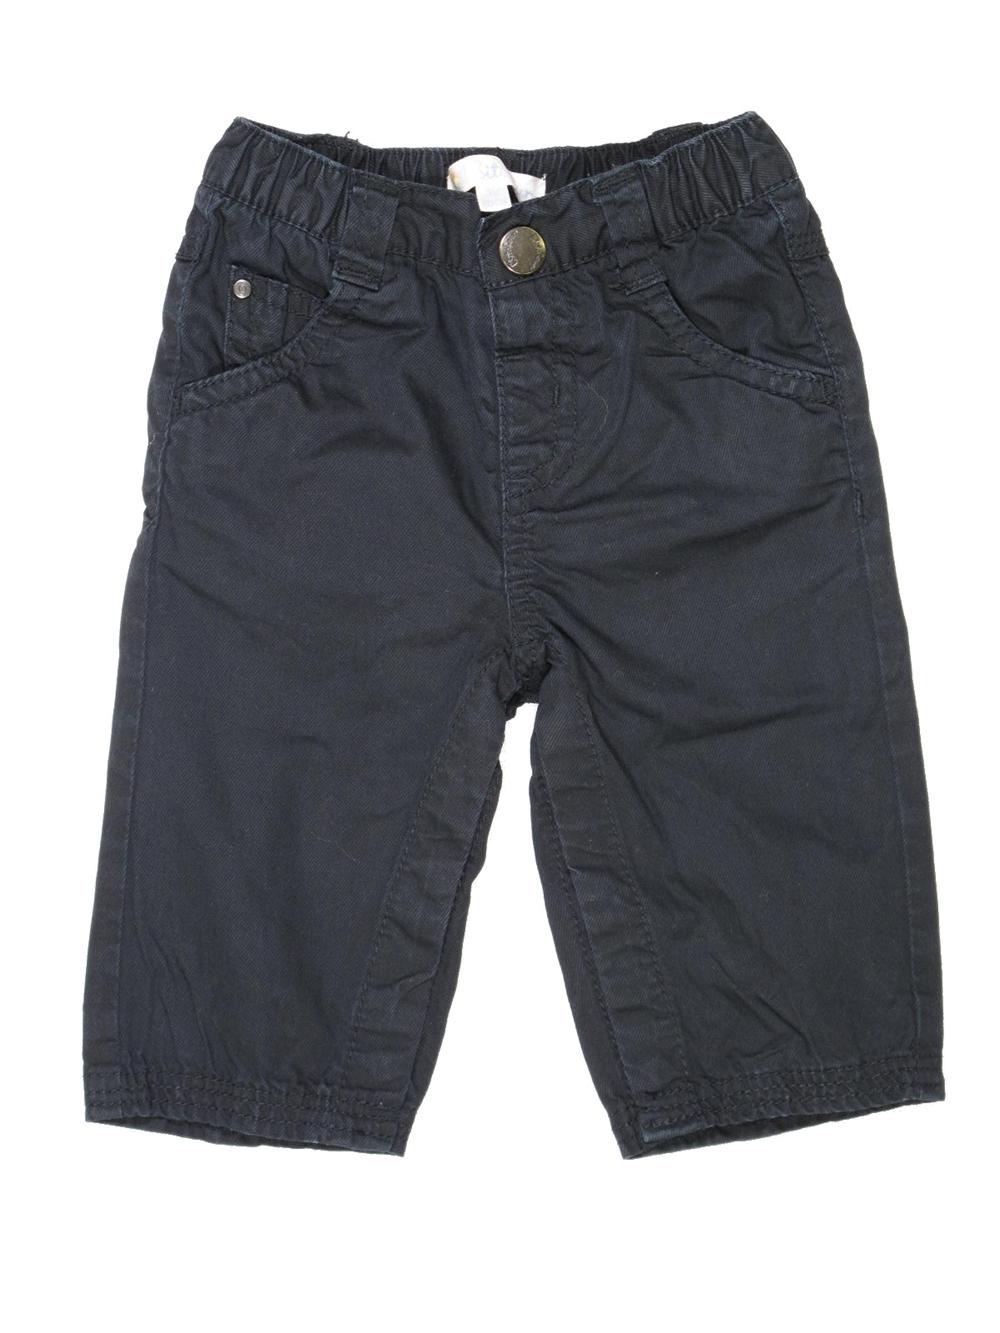 pantalon garcon kiabi 3 mois pas cher. Black Bedroom Furniture Sets. Home Design Ideas